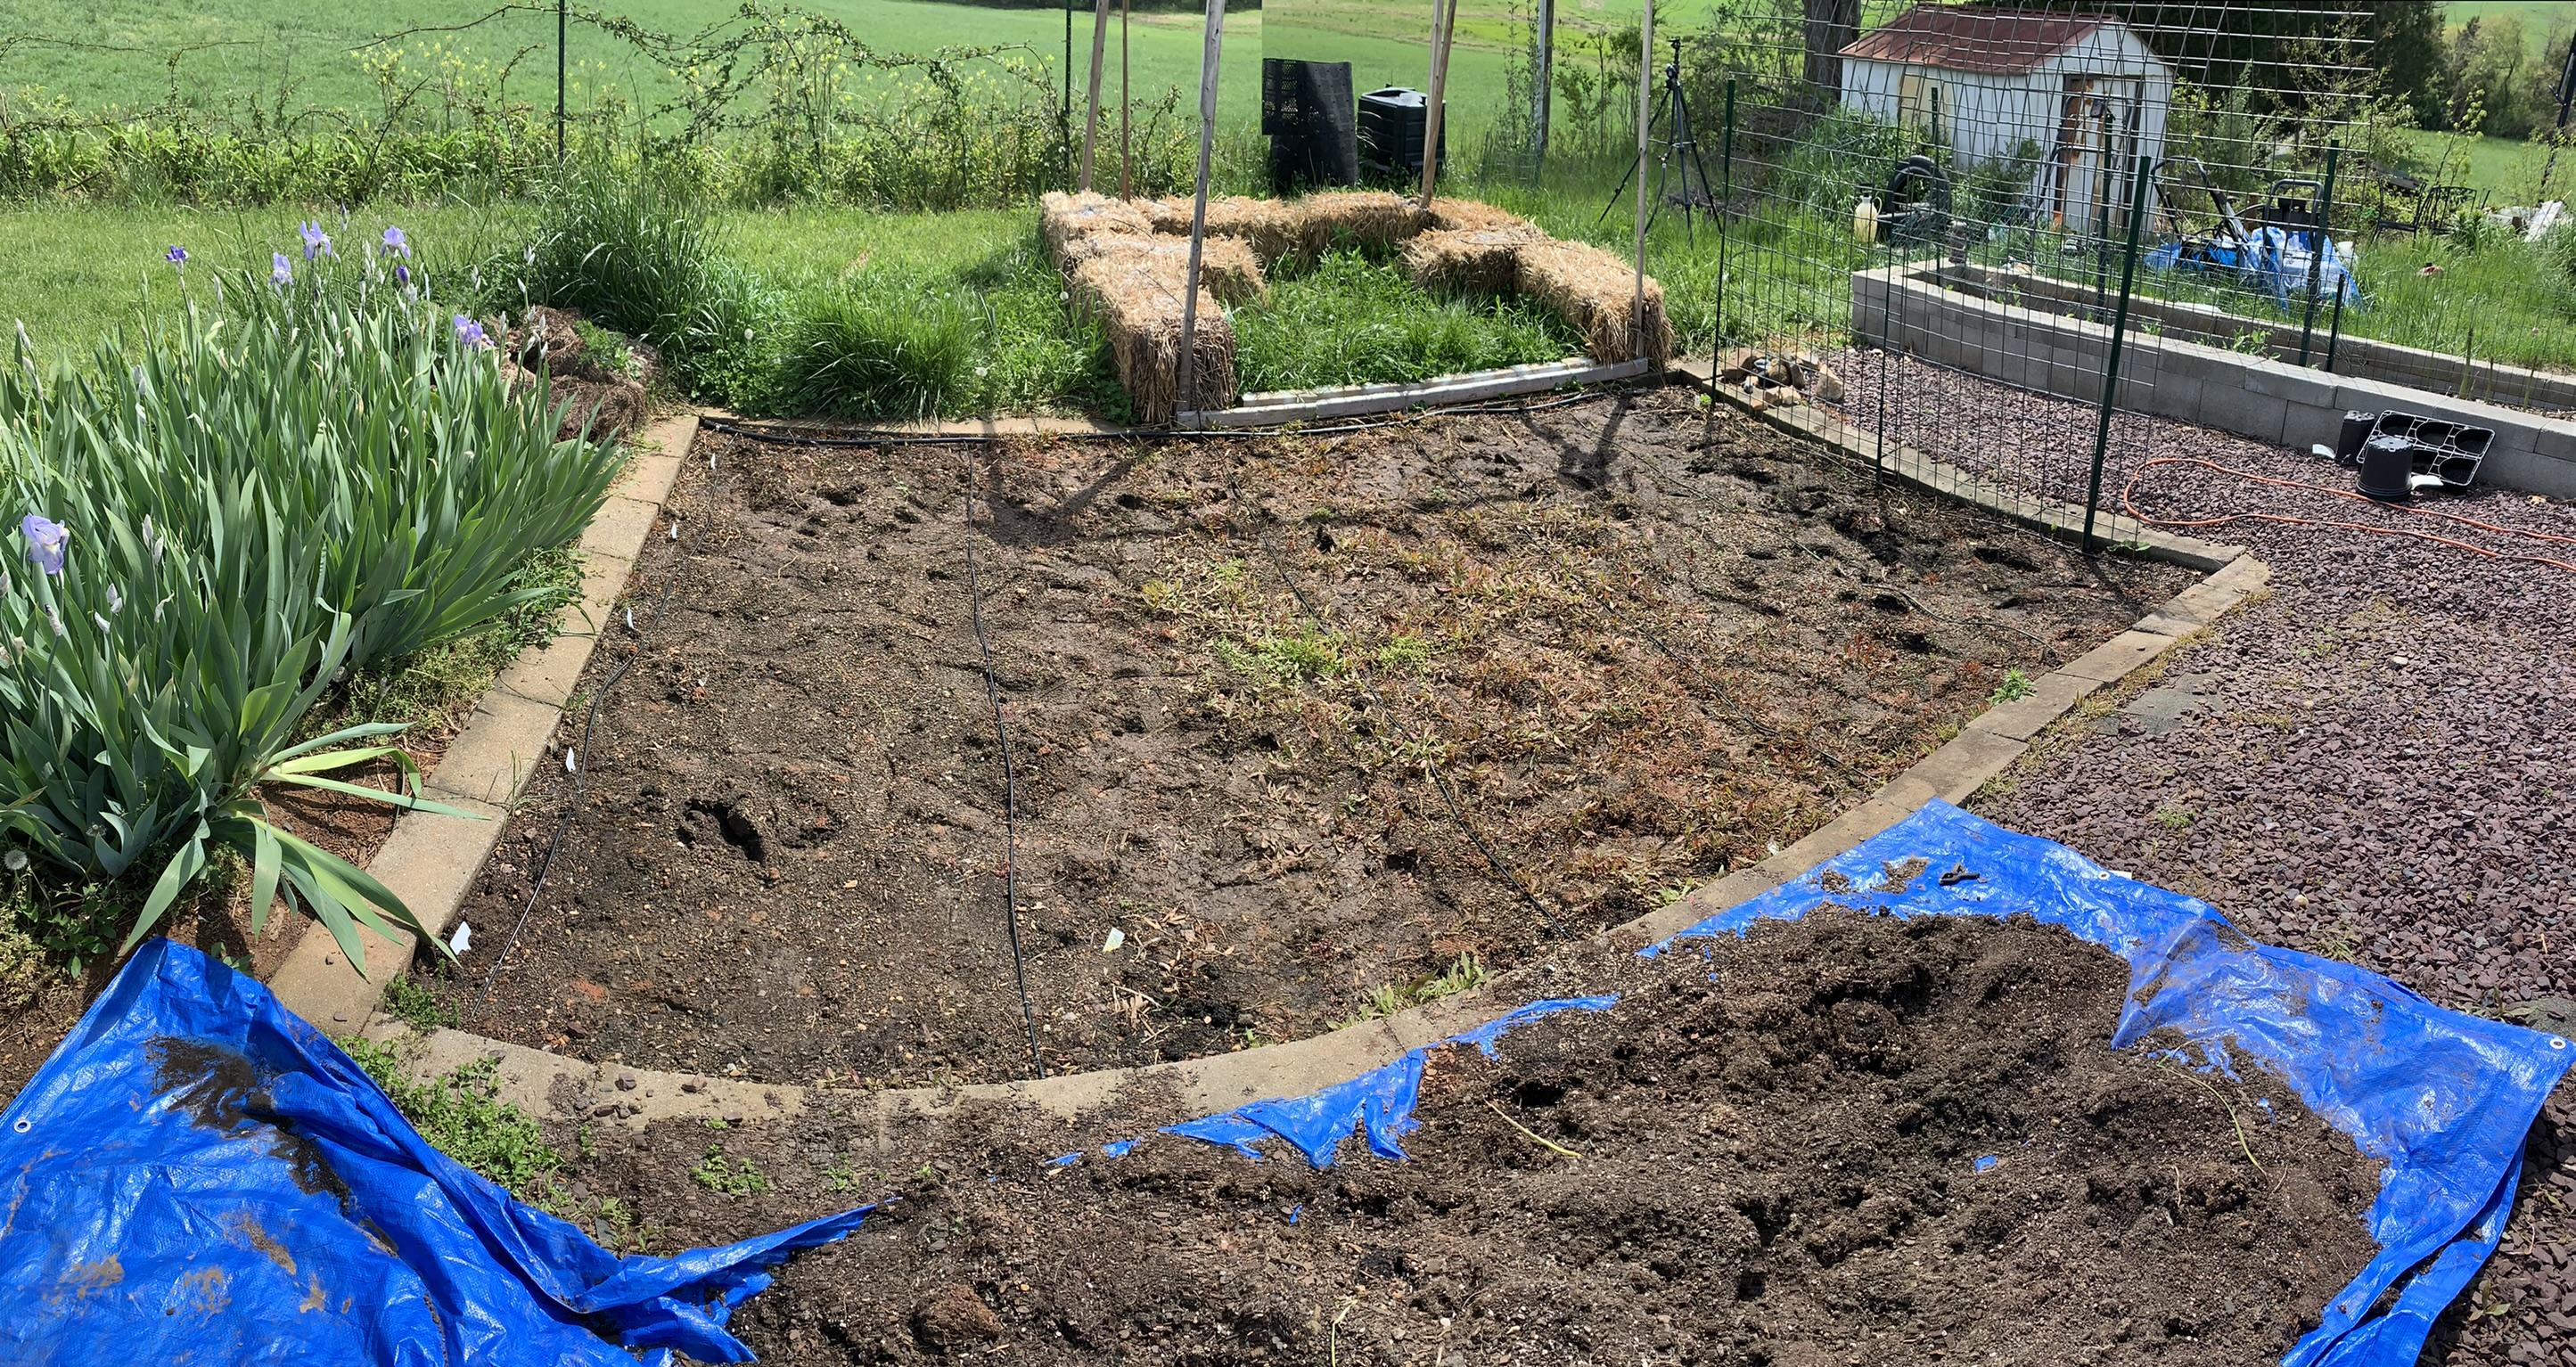 F34F92DF 7248 44D3 851D 2D7406537179 Finished drip line, planting, sharing